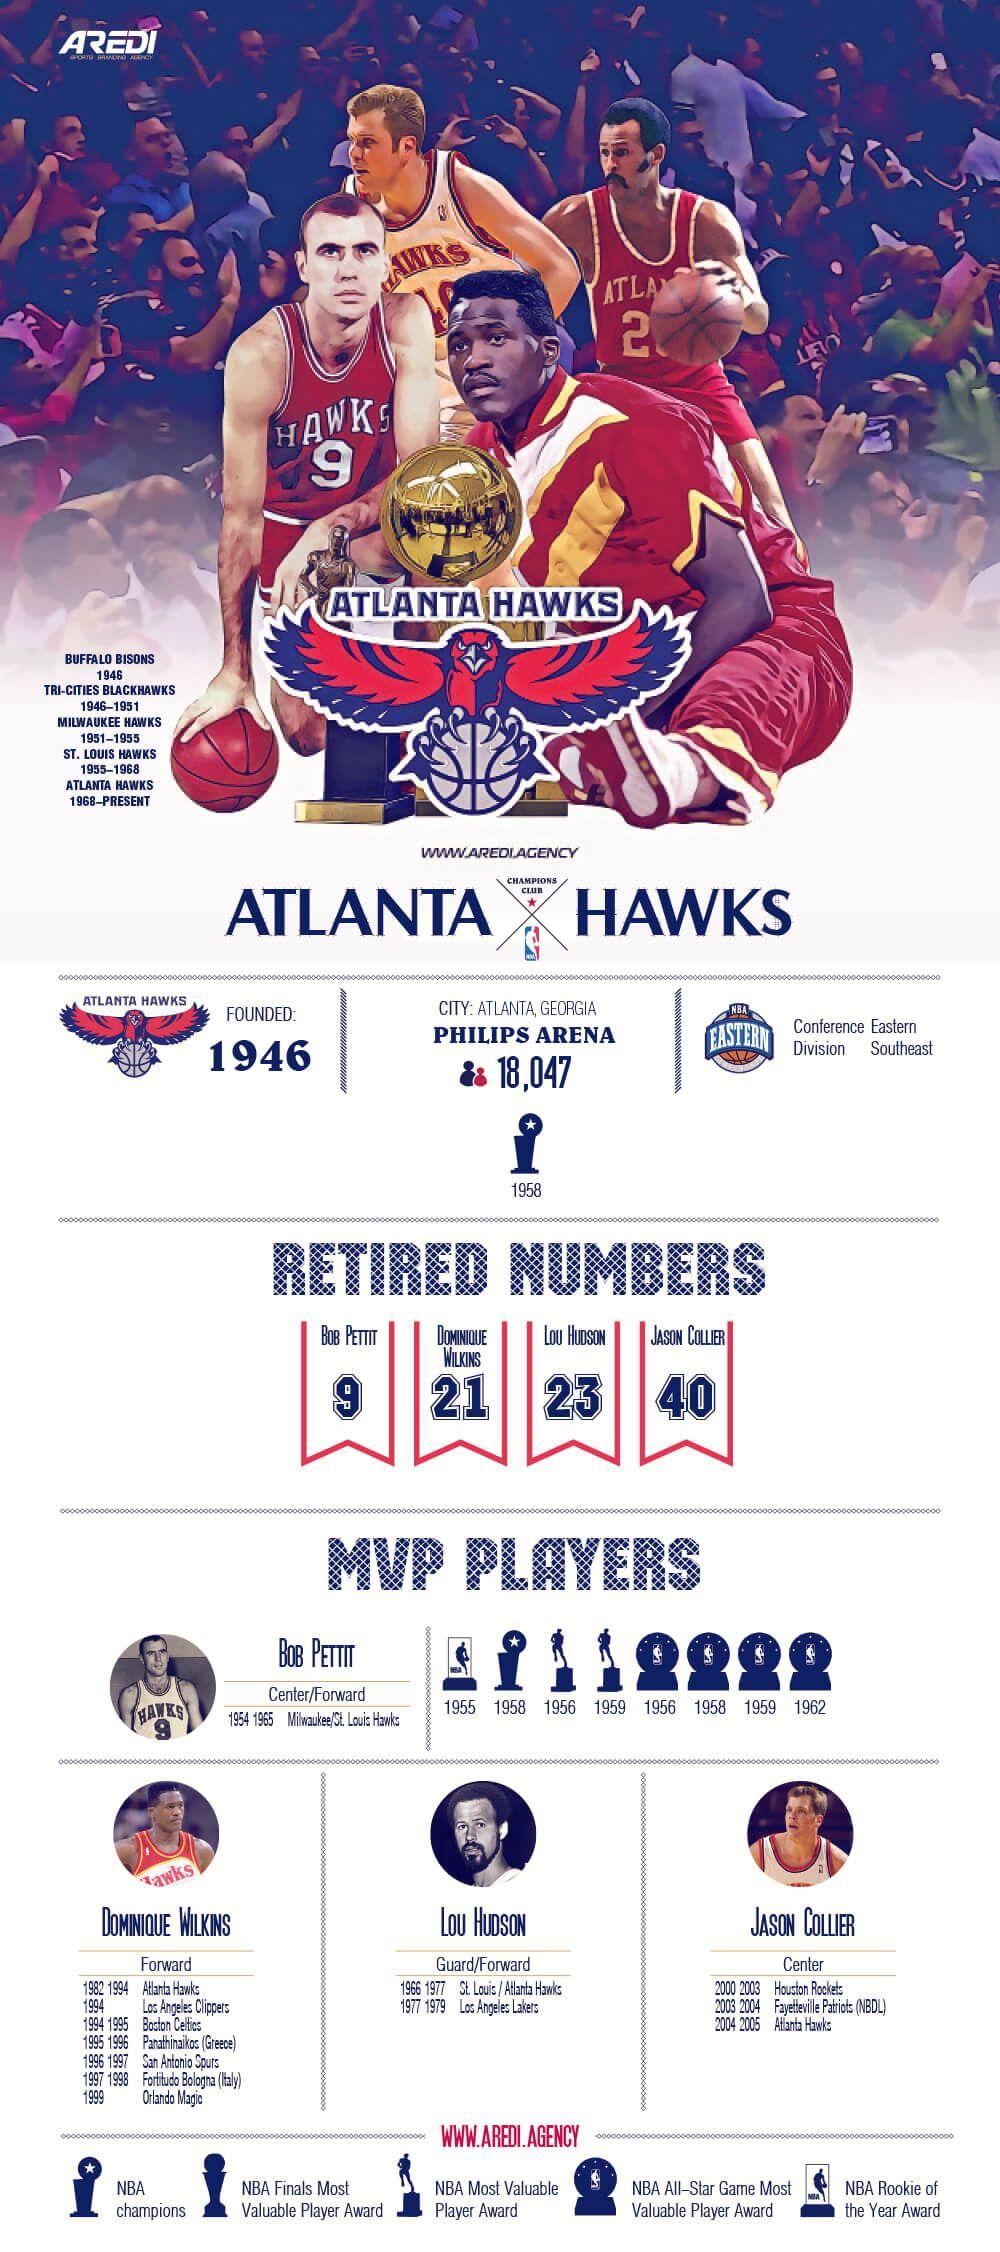 Google chrome themes crvena zvezda - The Best Players In The History Of The Atlanta Hawks Bob Pettit Dominique Wilkins